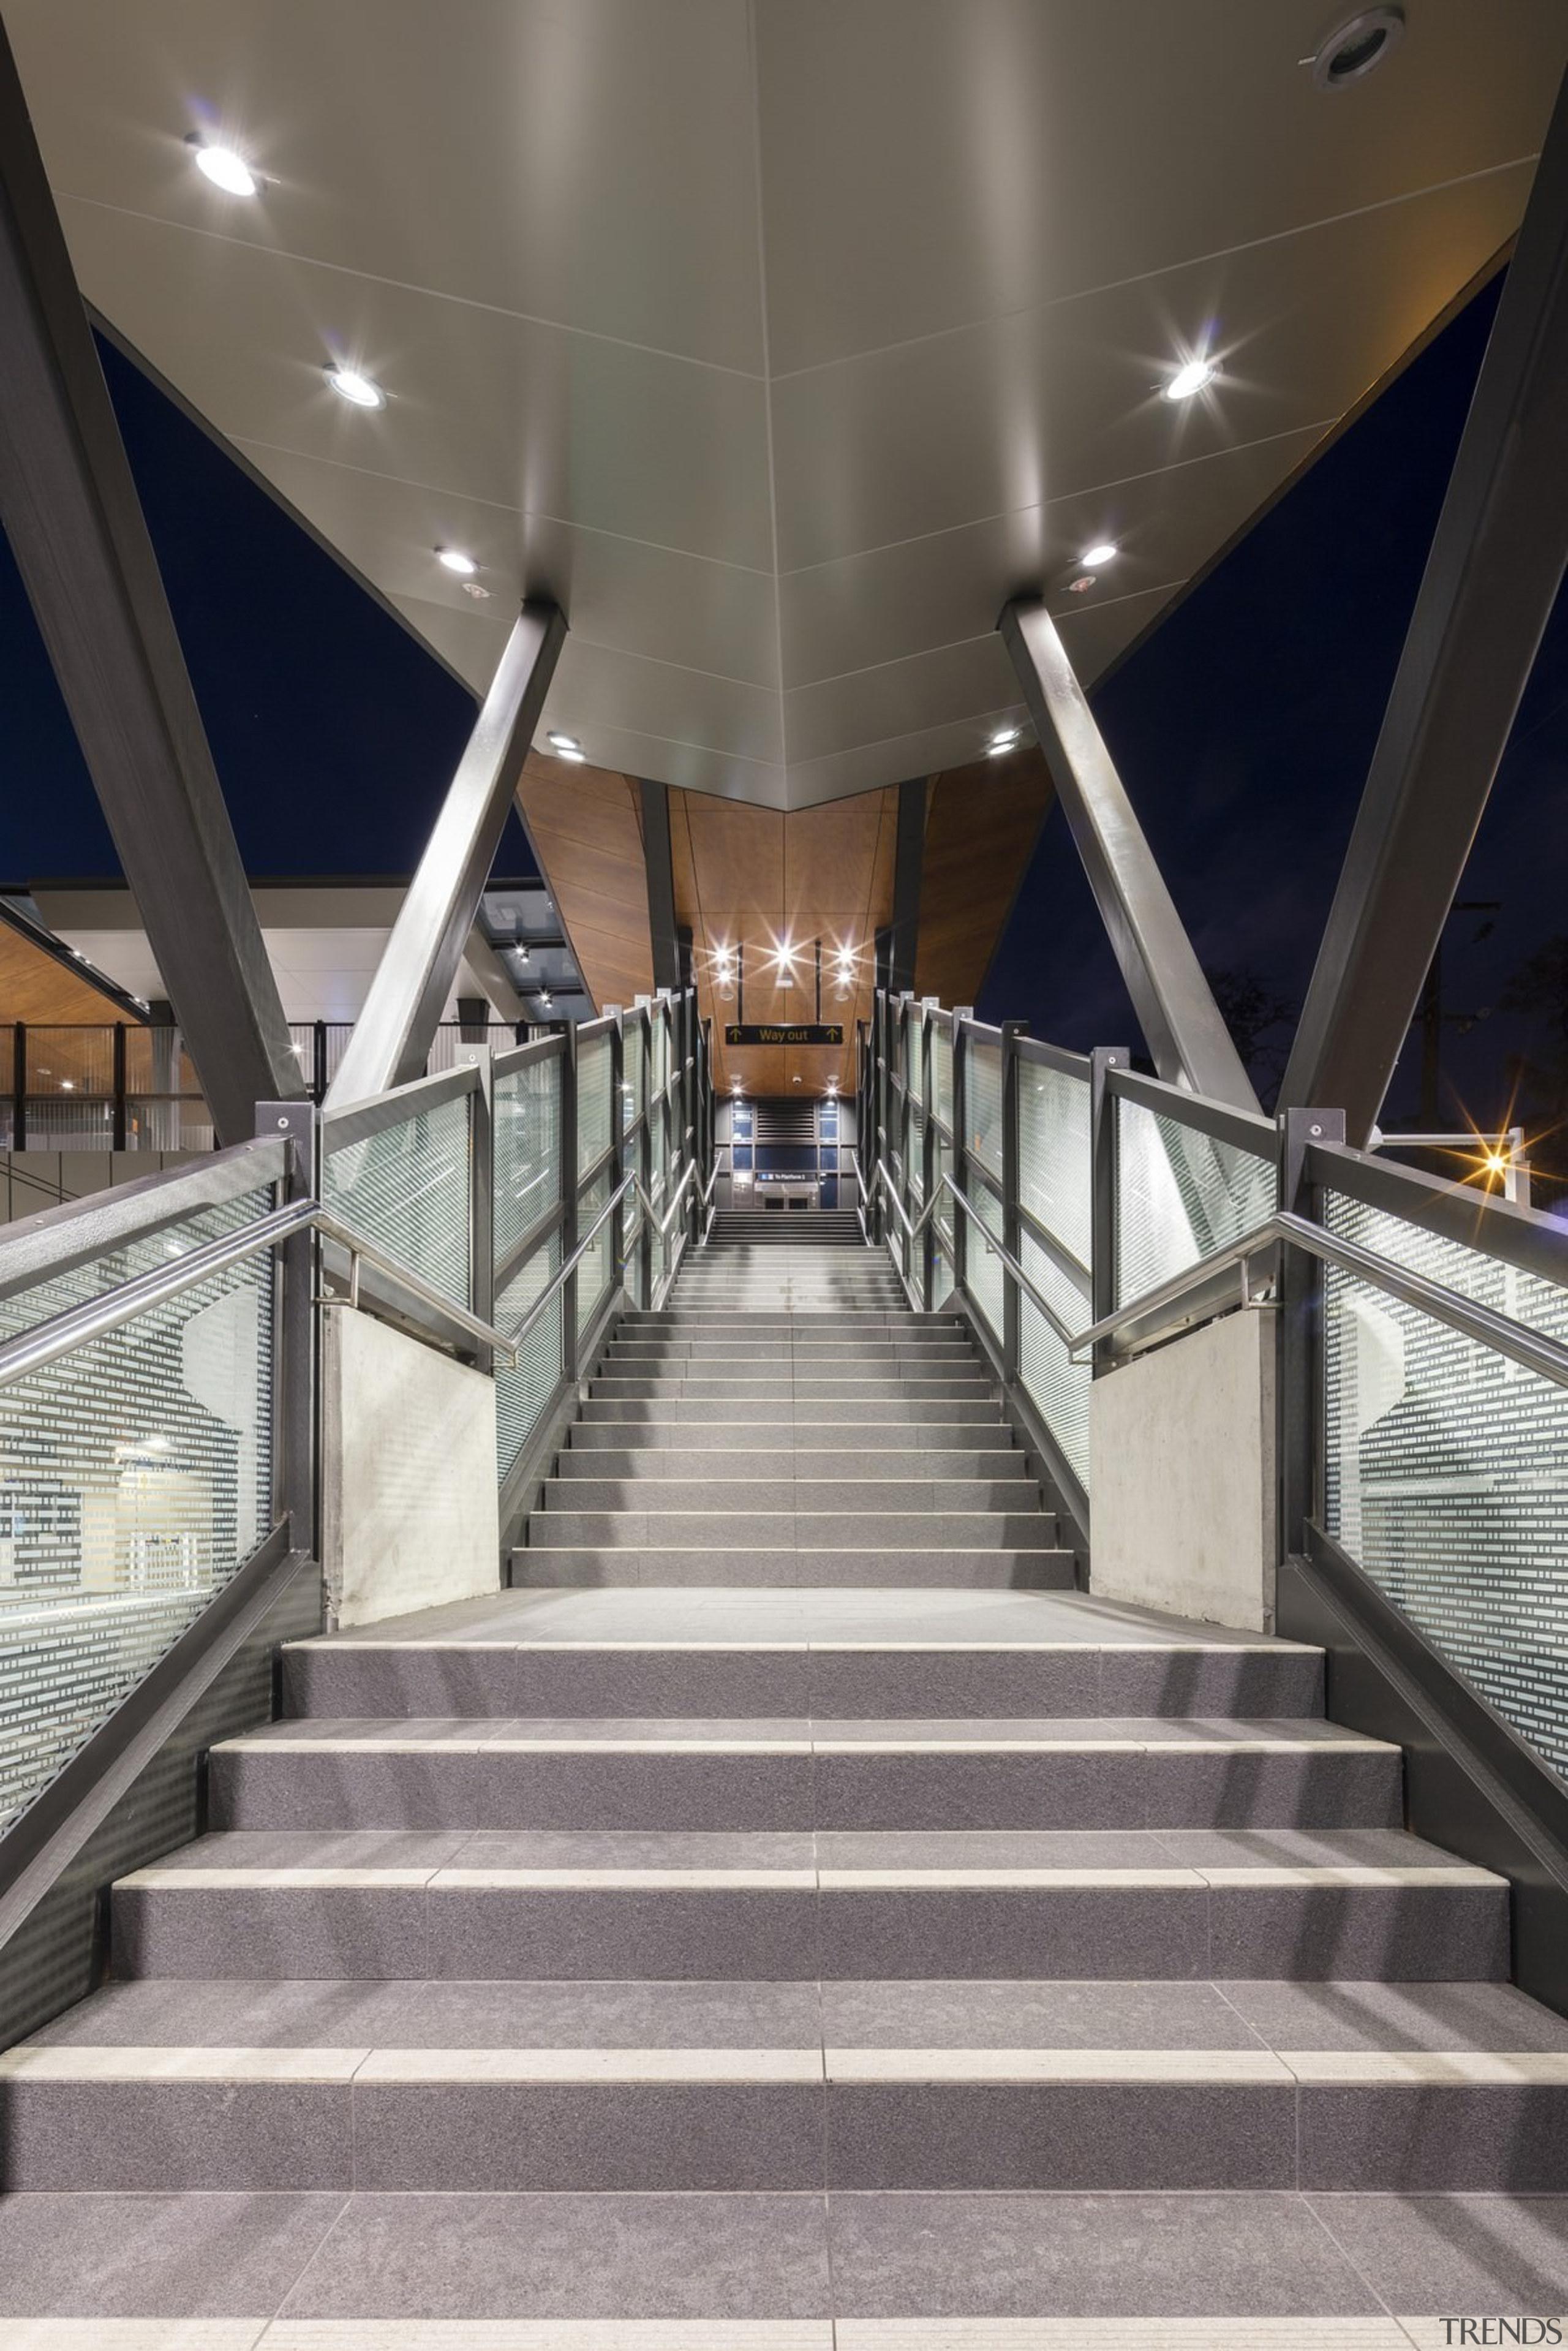 Cheltenham Station – Cox Architecture - Cheltenham Station architecture, daylighting, escalator, handrail, metropolitan area, stairs, structure, symmetry, gray, black